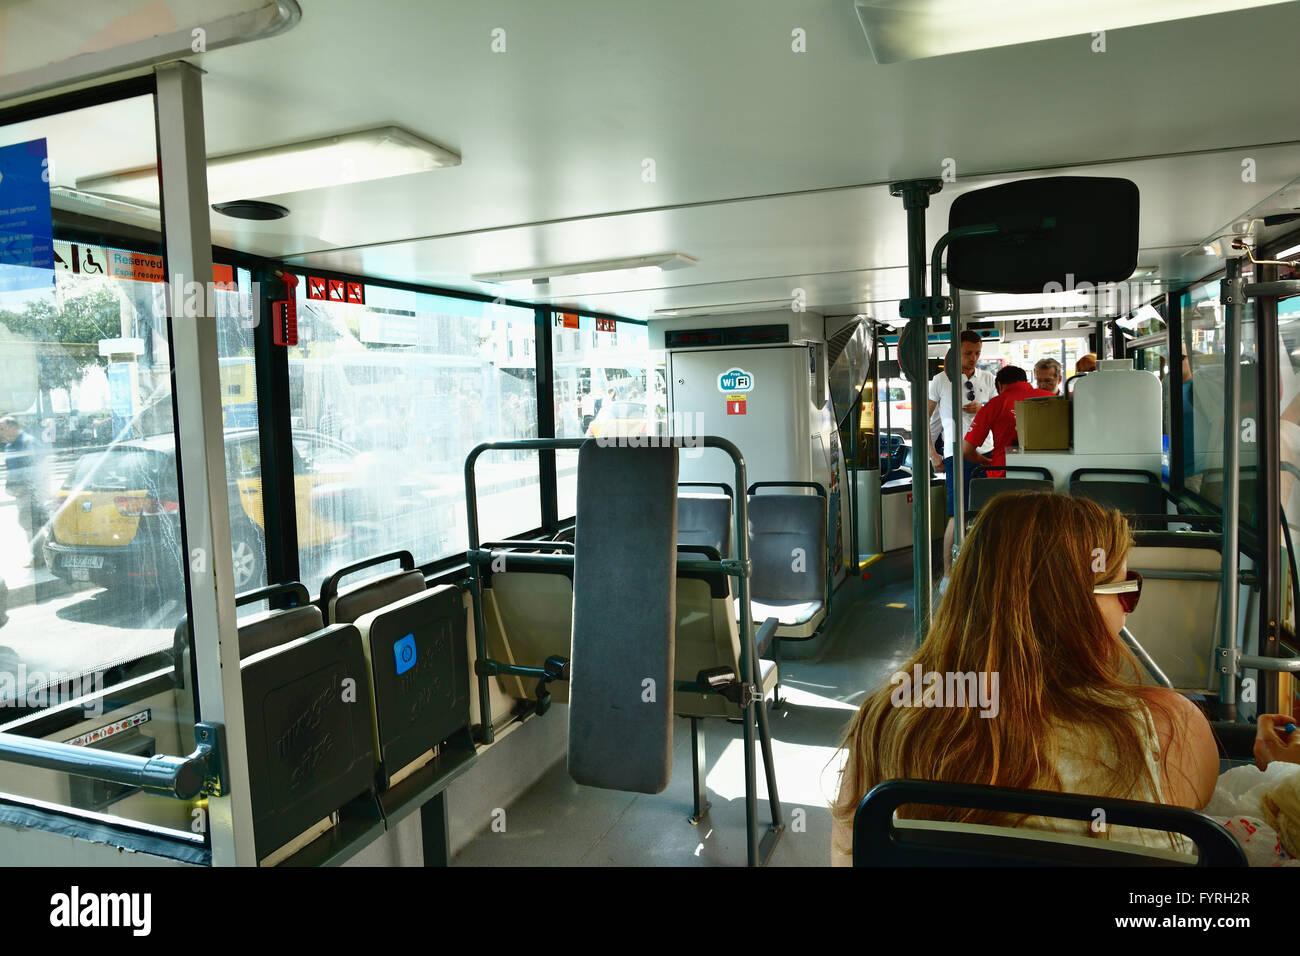 Urban bus. Barcelona, Catalonia, Spain, Europe - Stock Image